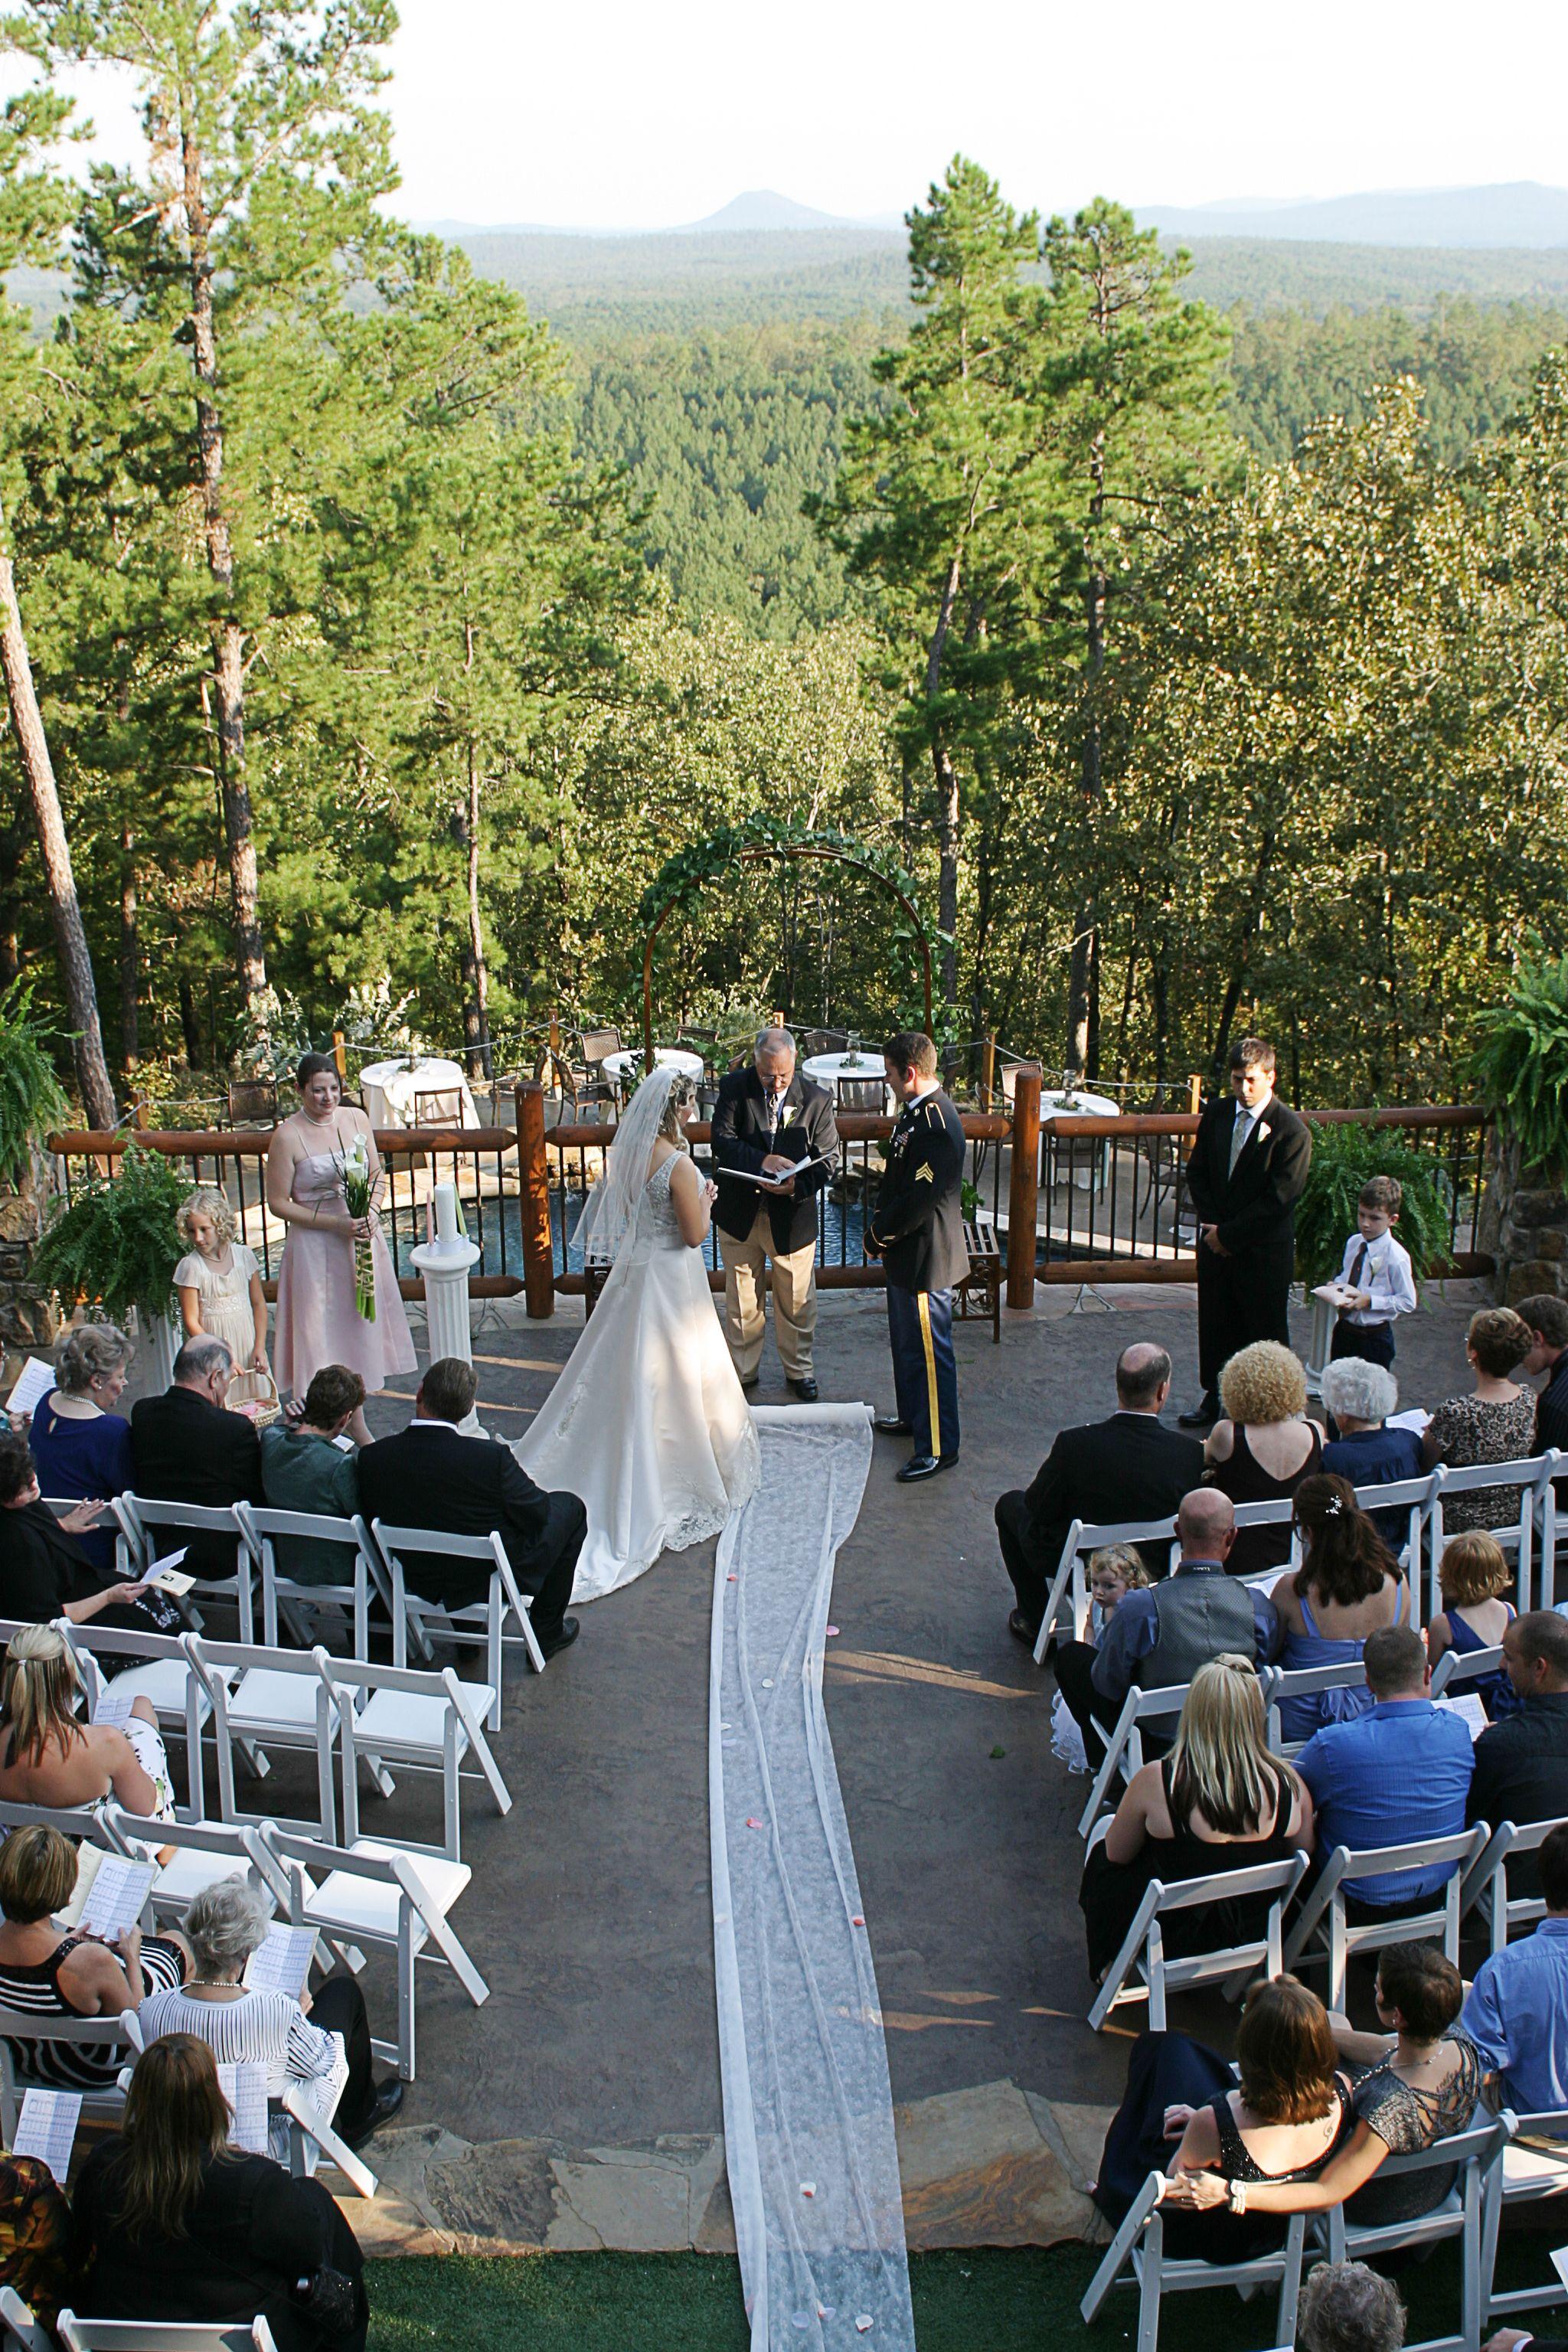 Roland Ar Wedding Venue At An Enchanting Evening Overlooking Lake Maumelle And Pinn Arkansas Wedding Venues Outdoor Wedding Venues Northwest Arkansas Weddings